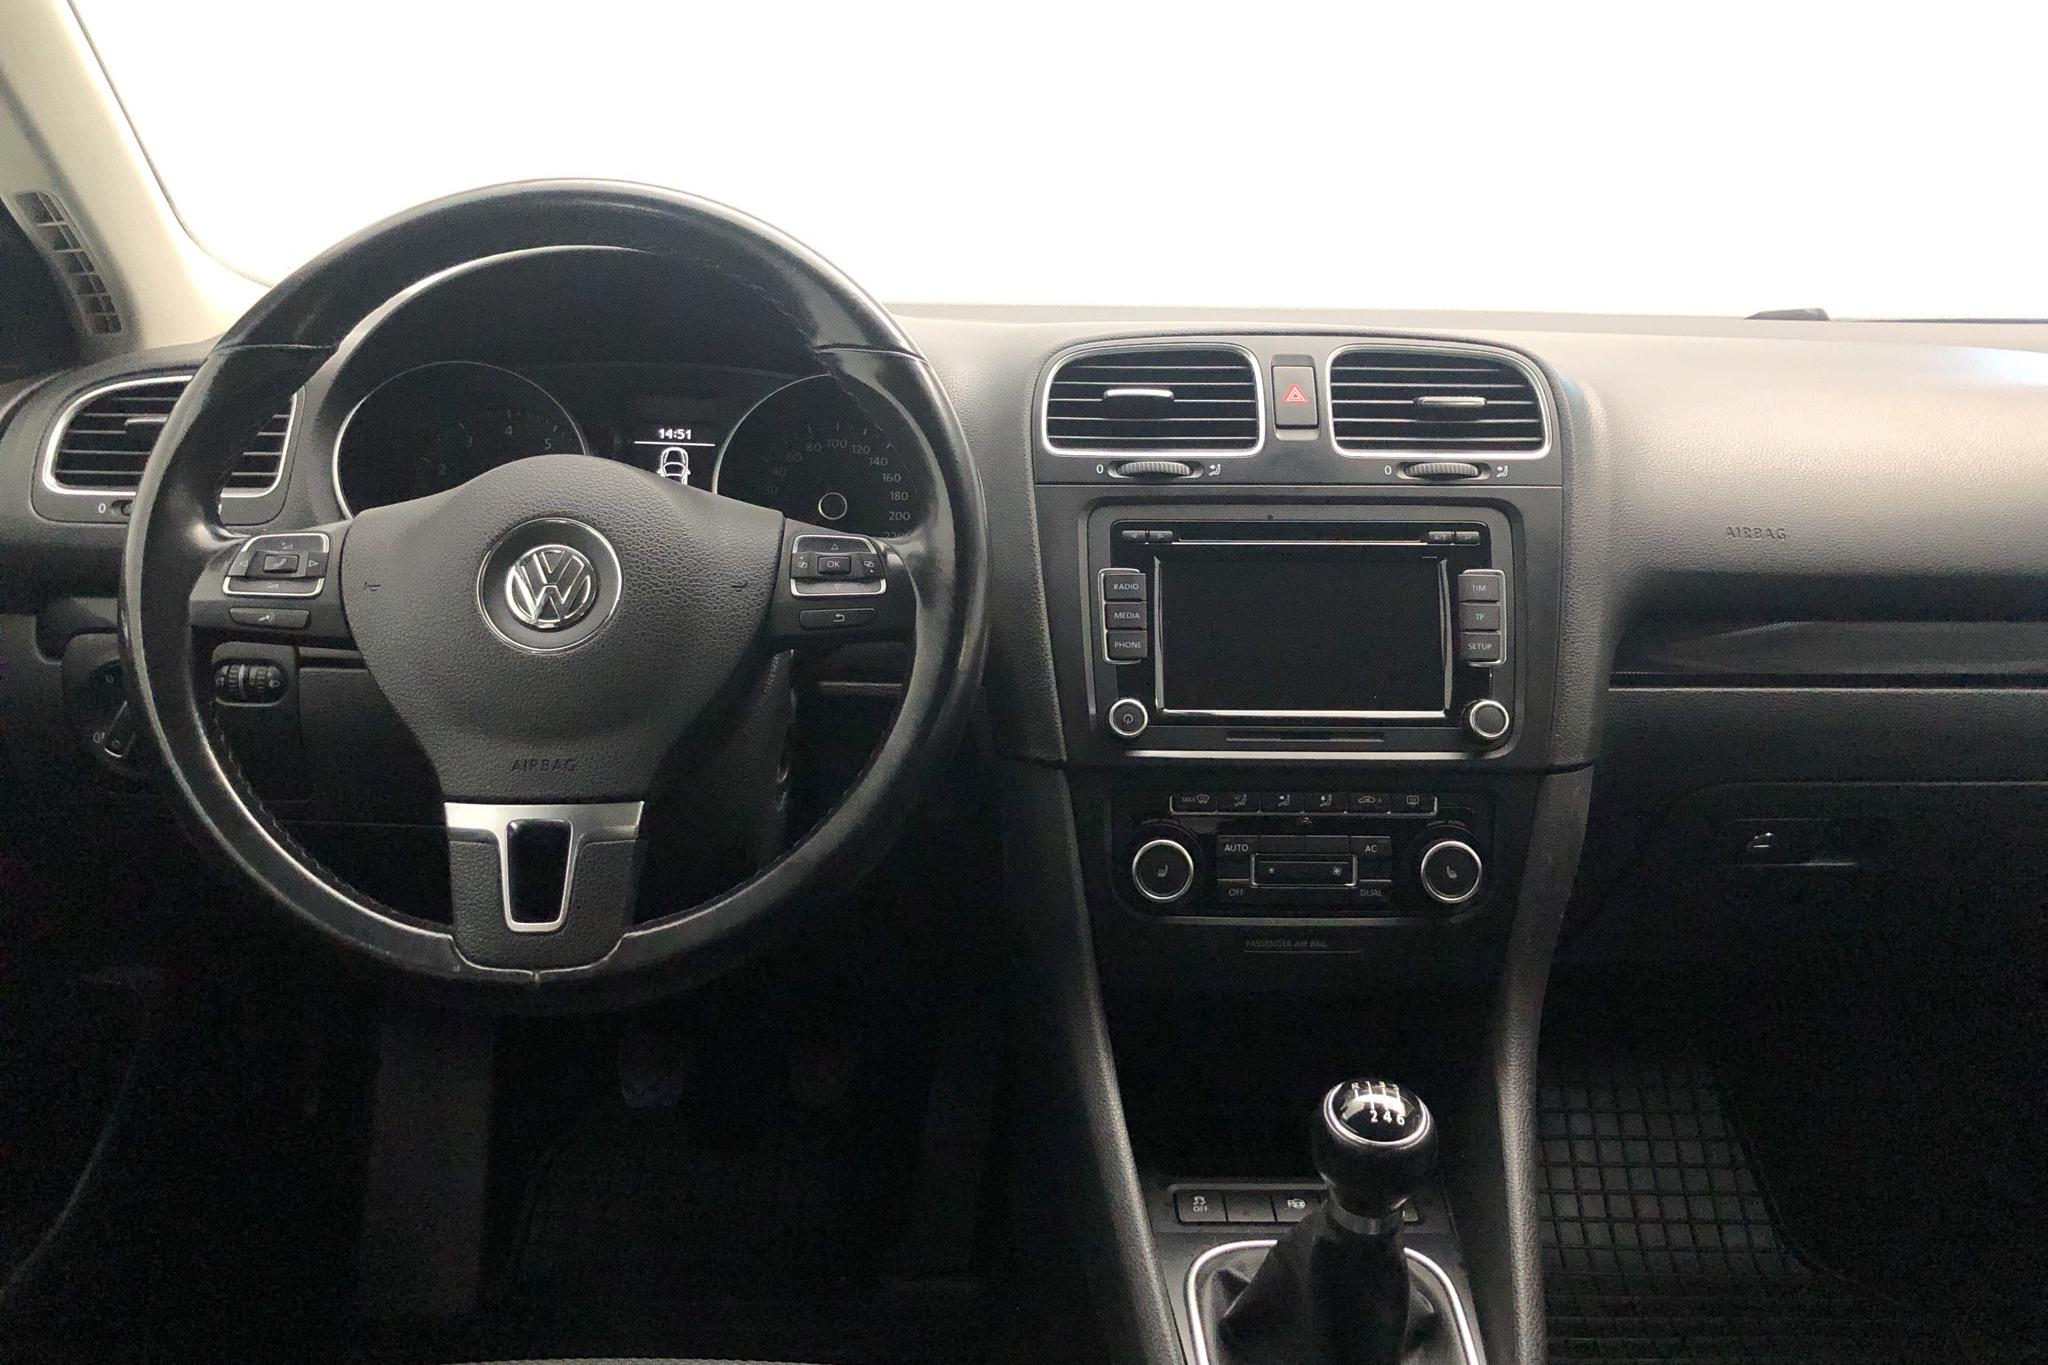 VW Golf VI 1.4 TSI Variant (122hk) - 173 700 km - Manual - silver - 2011